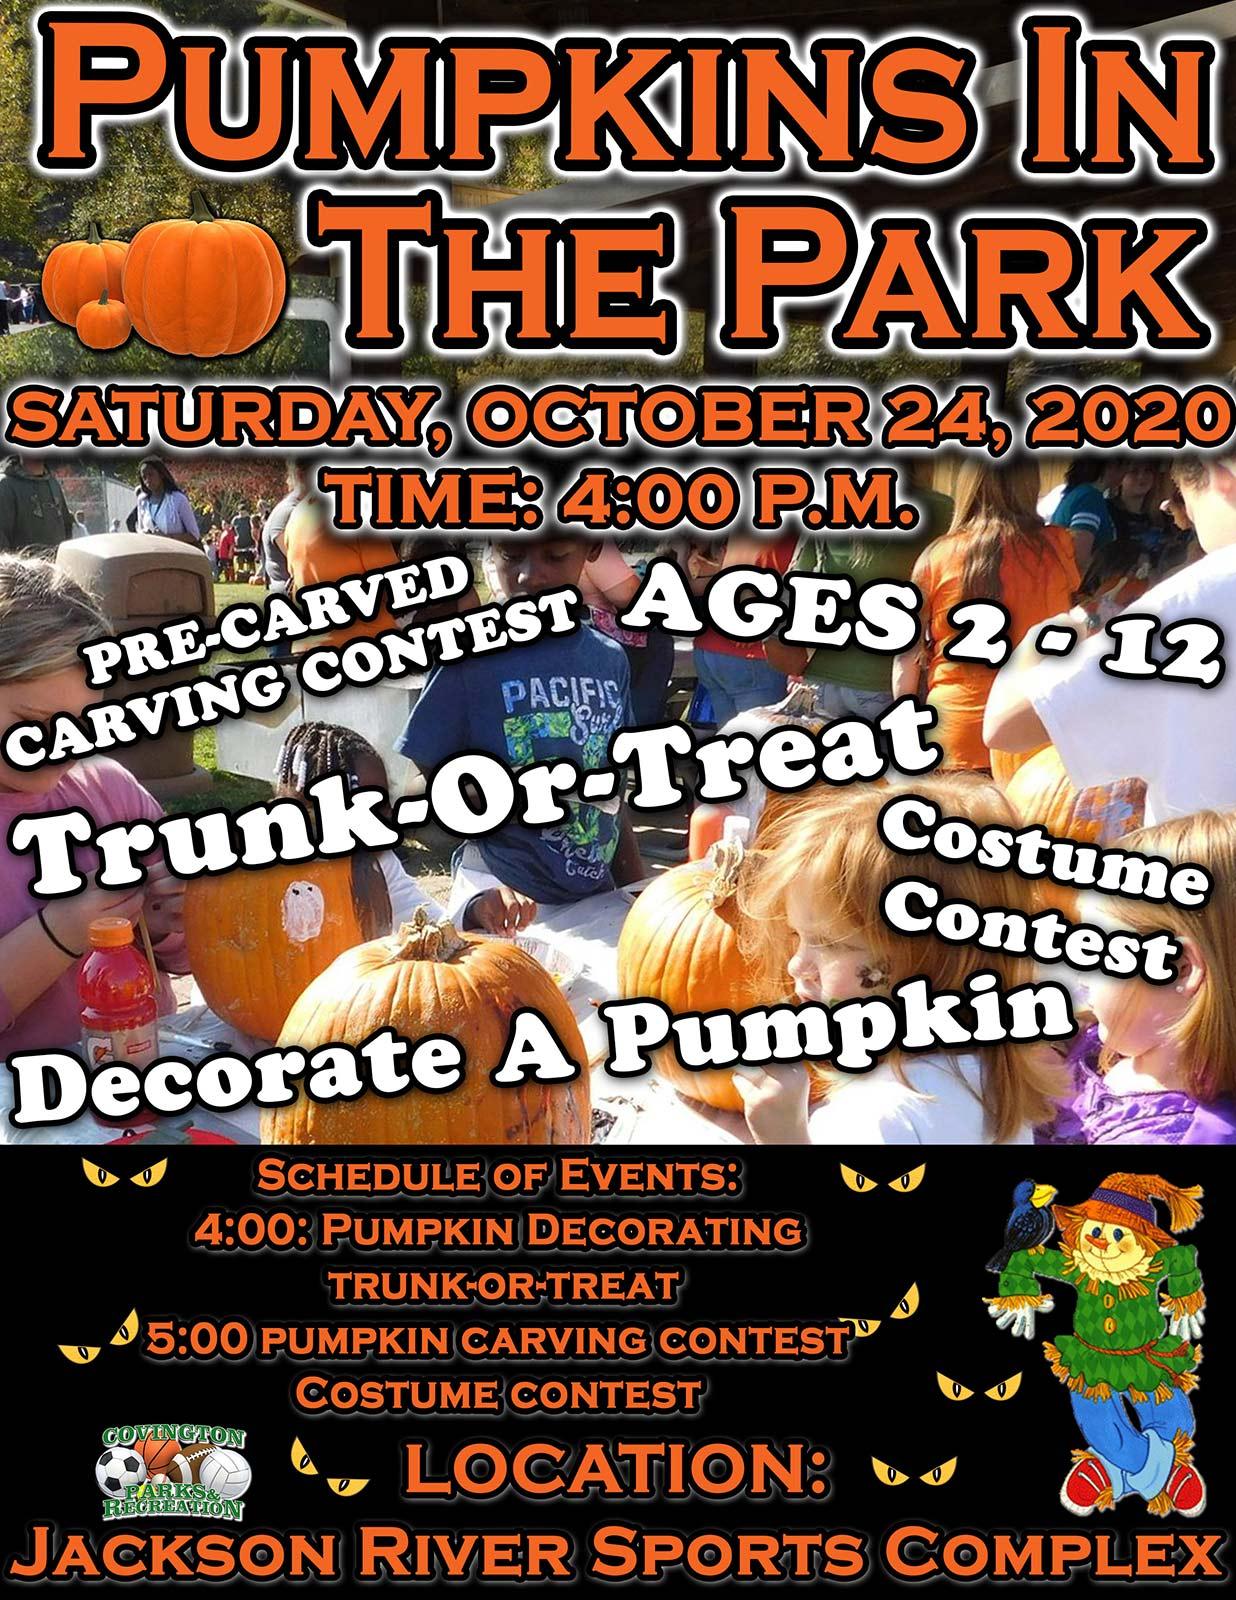 Pumpkins In The Park2020